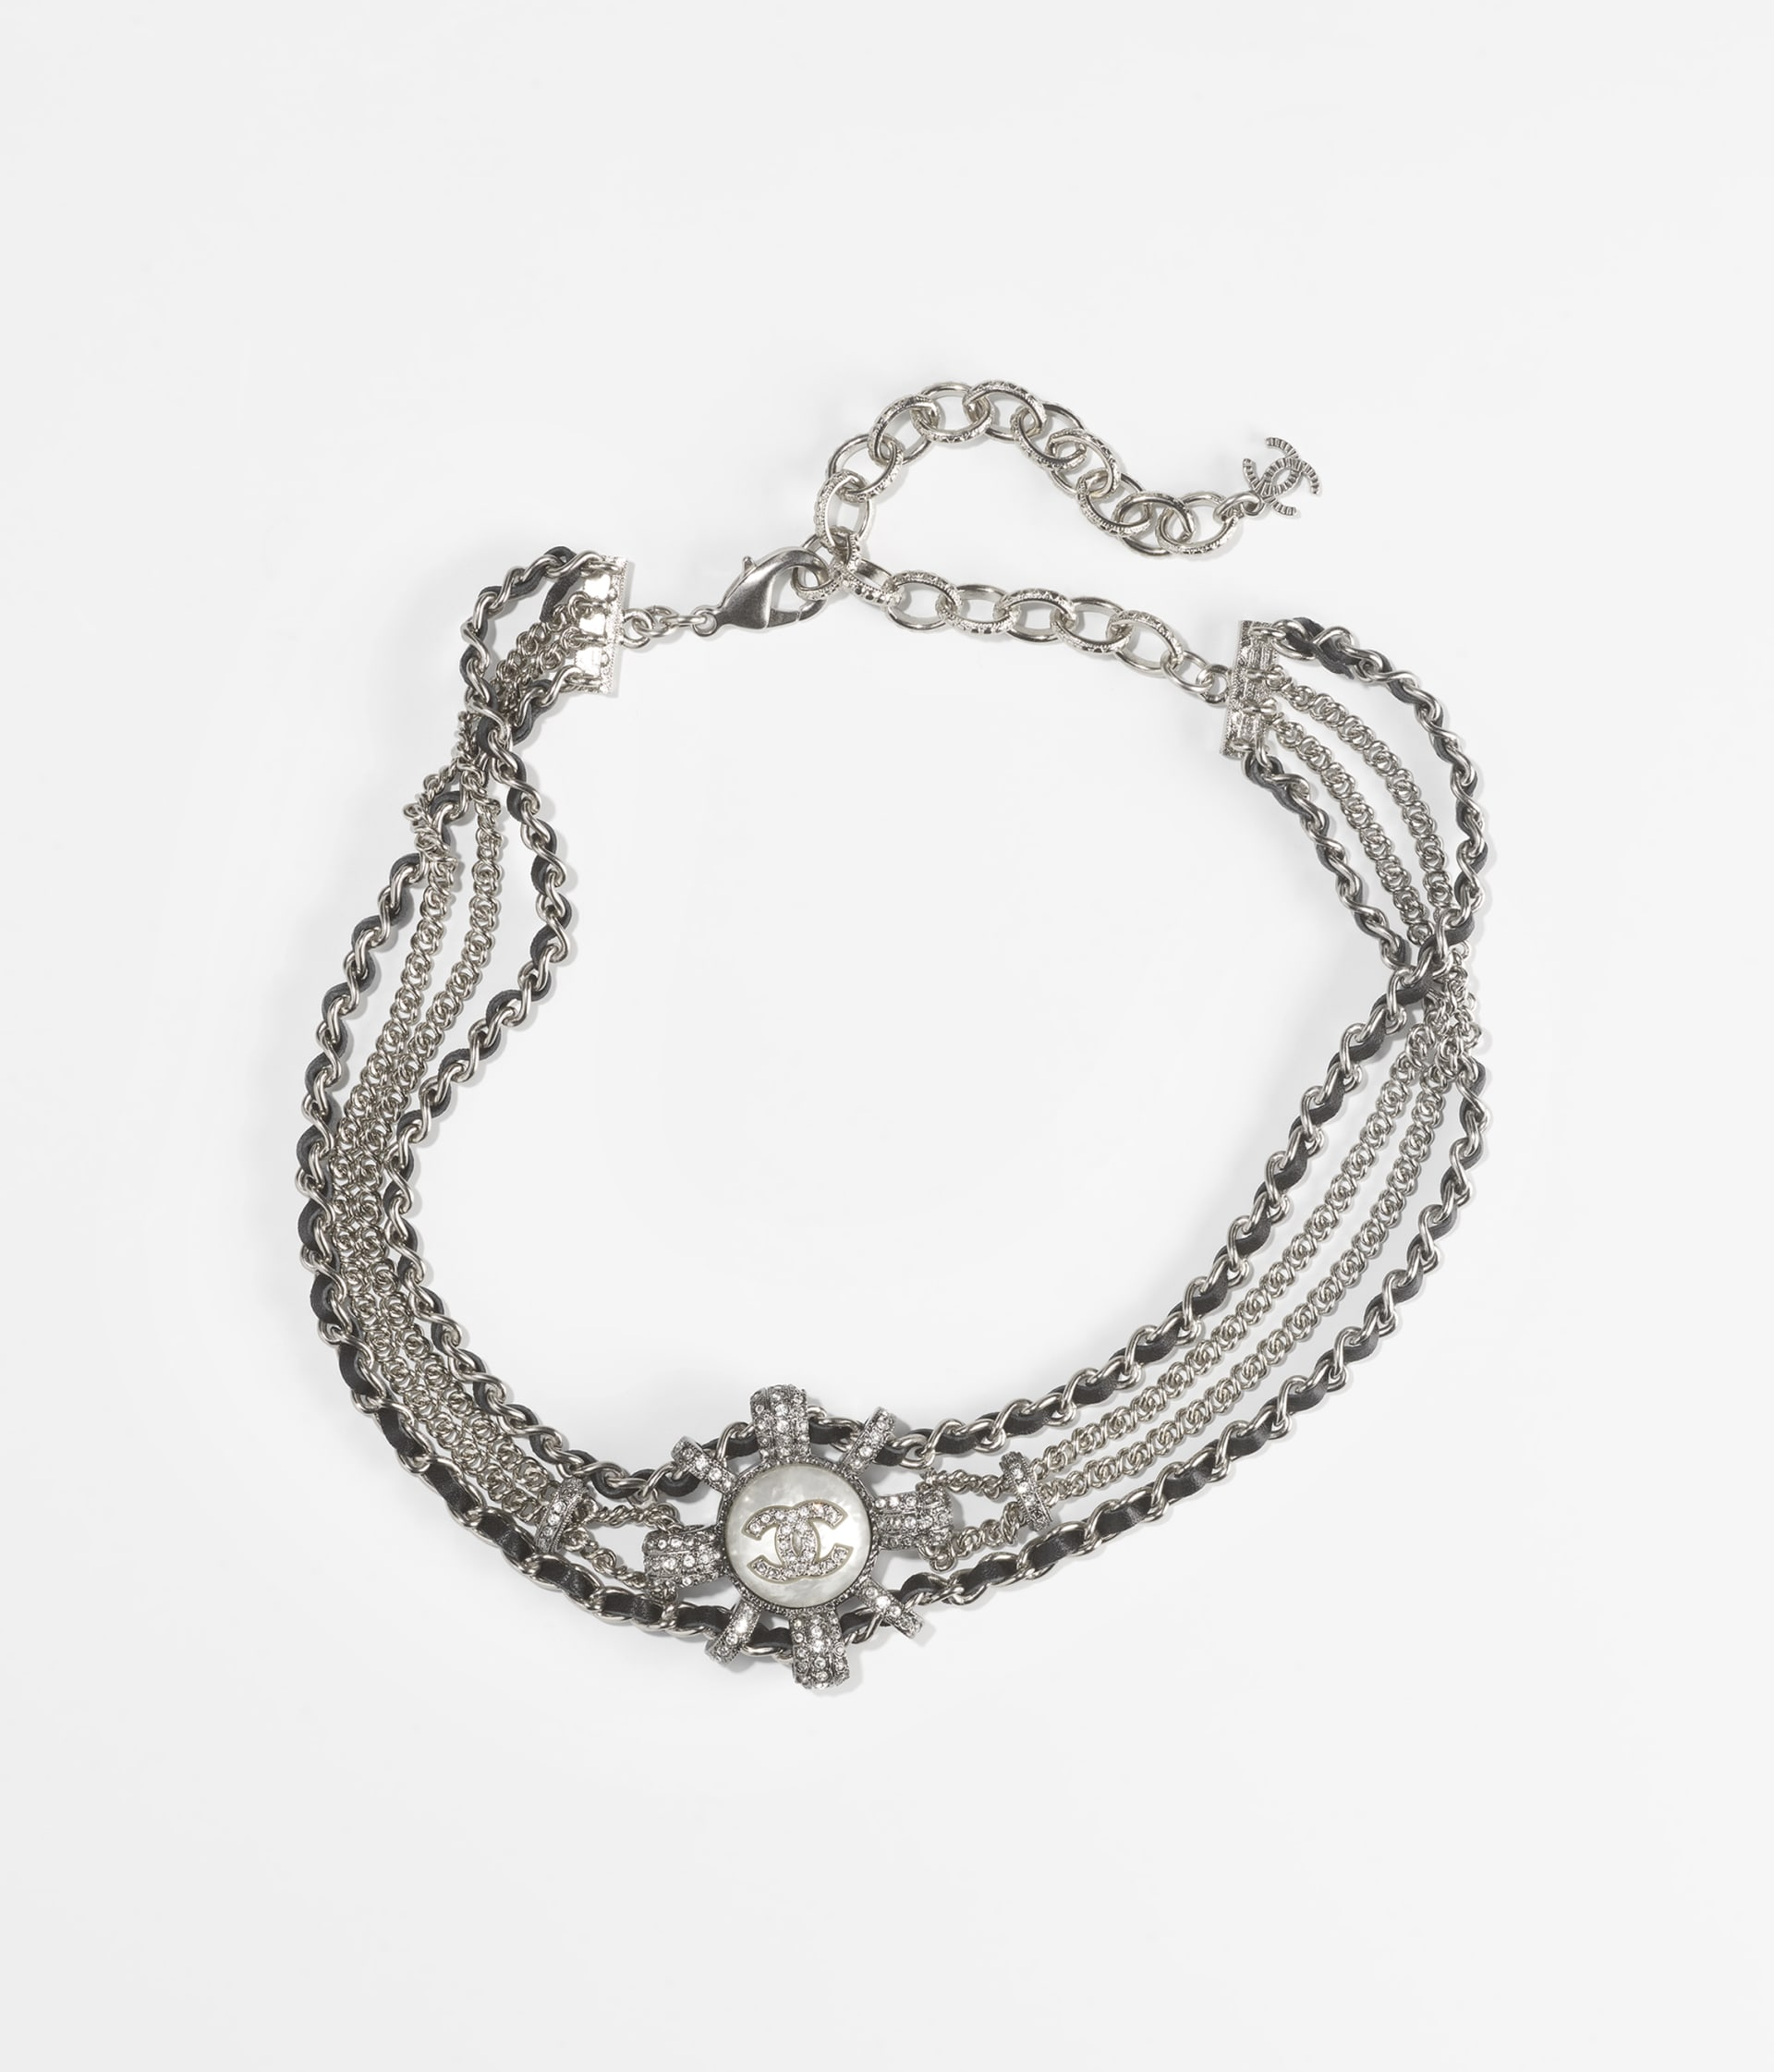 image 1 - Choker - Metal, Calfskin, Imitation Pearls & Strass - Silver, Ruthenium, Black, Pearly White & Crystal